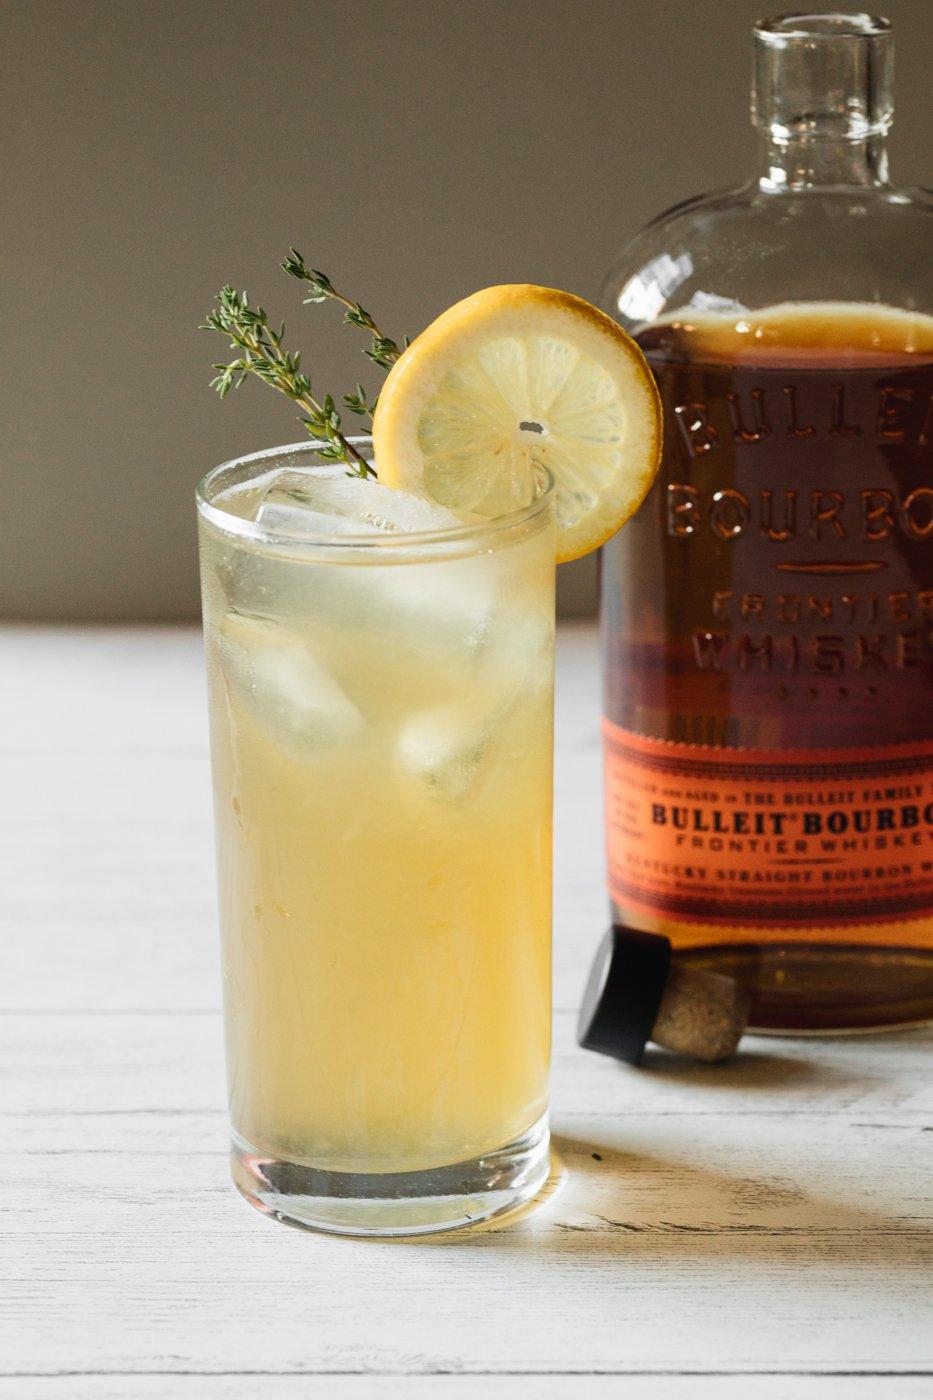 Honey Thyme Lemonade made with Bulleit Bourbon